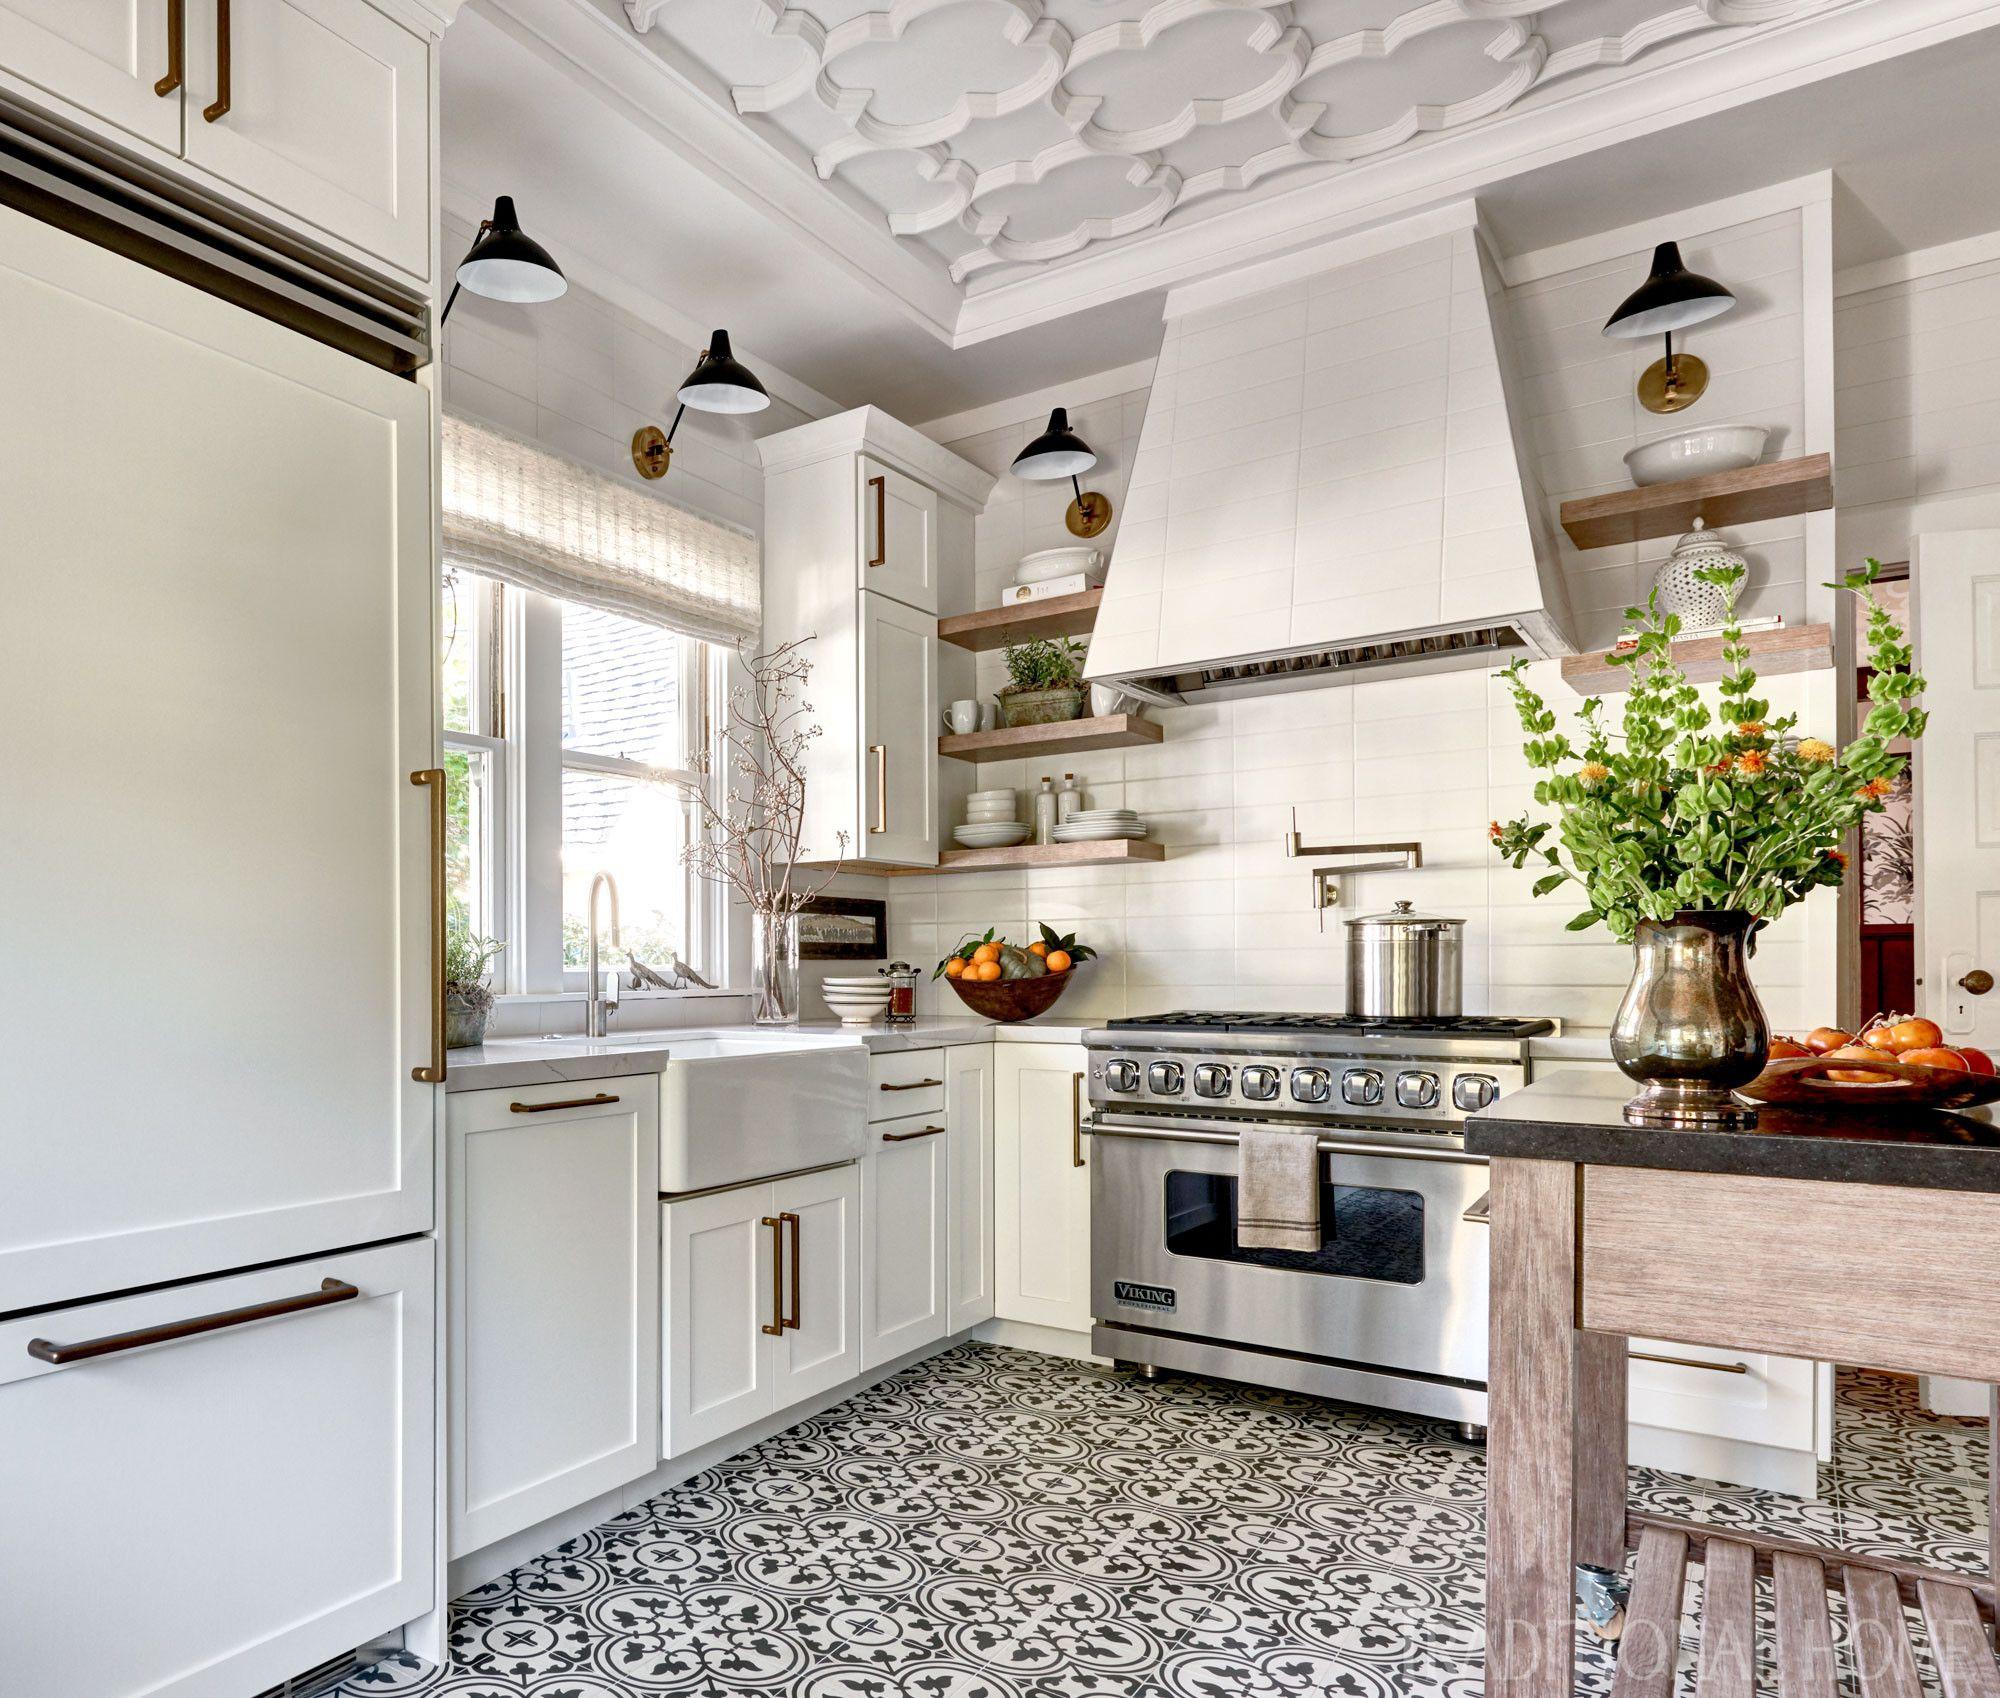 Floating Kitchen Floor Tiles New Home Design Plus Home Improvement ...